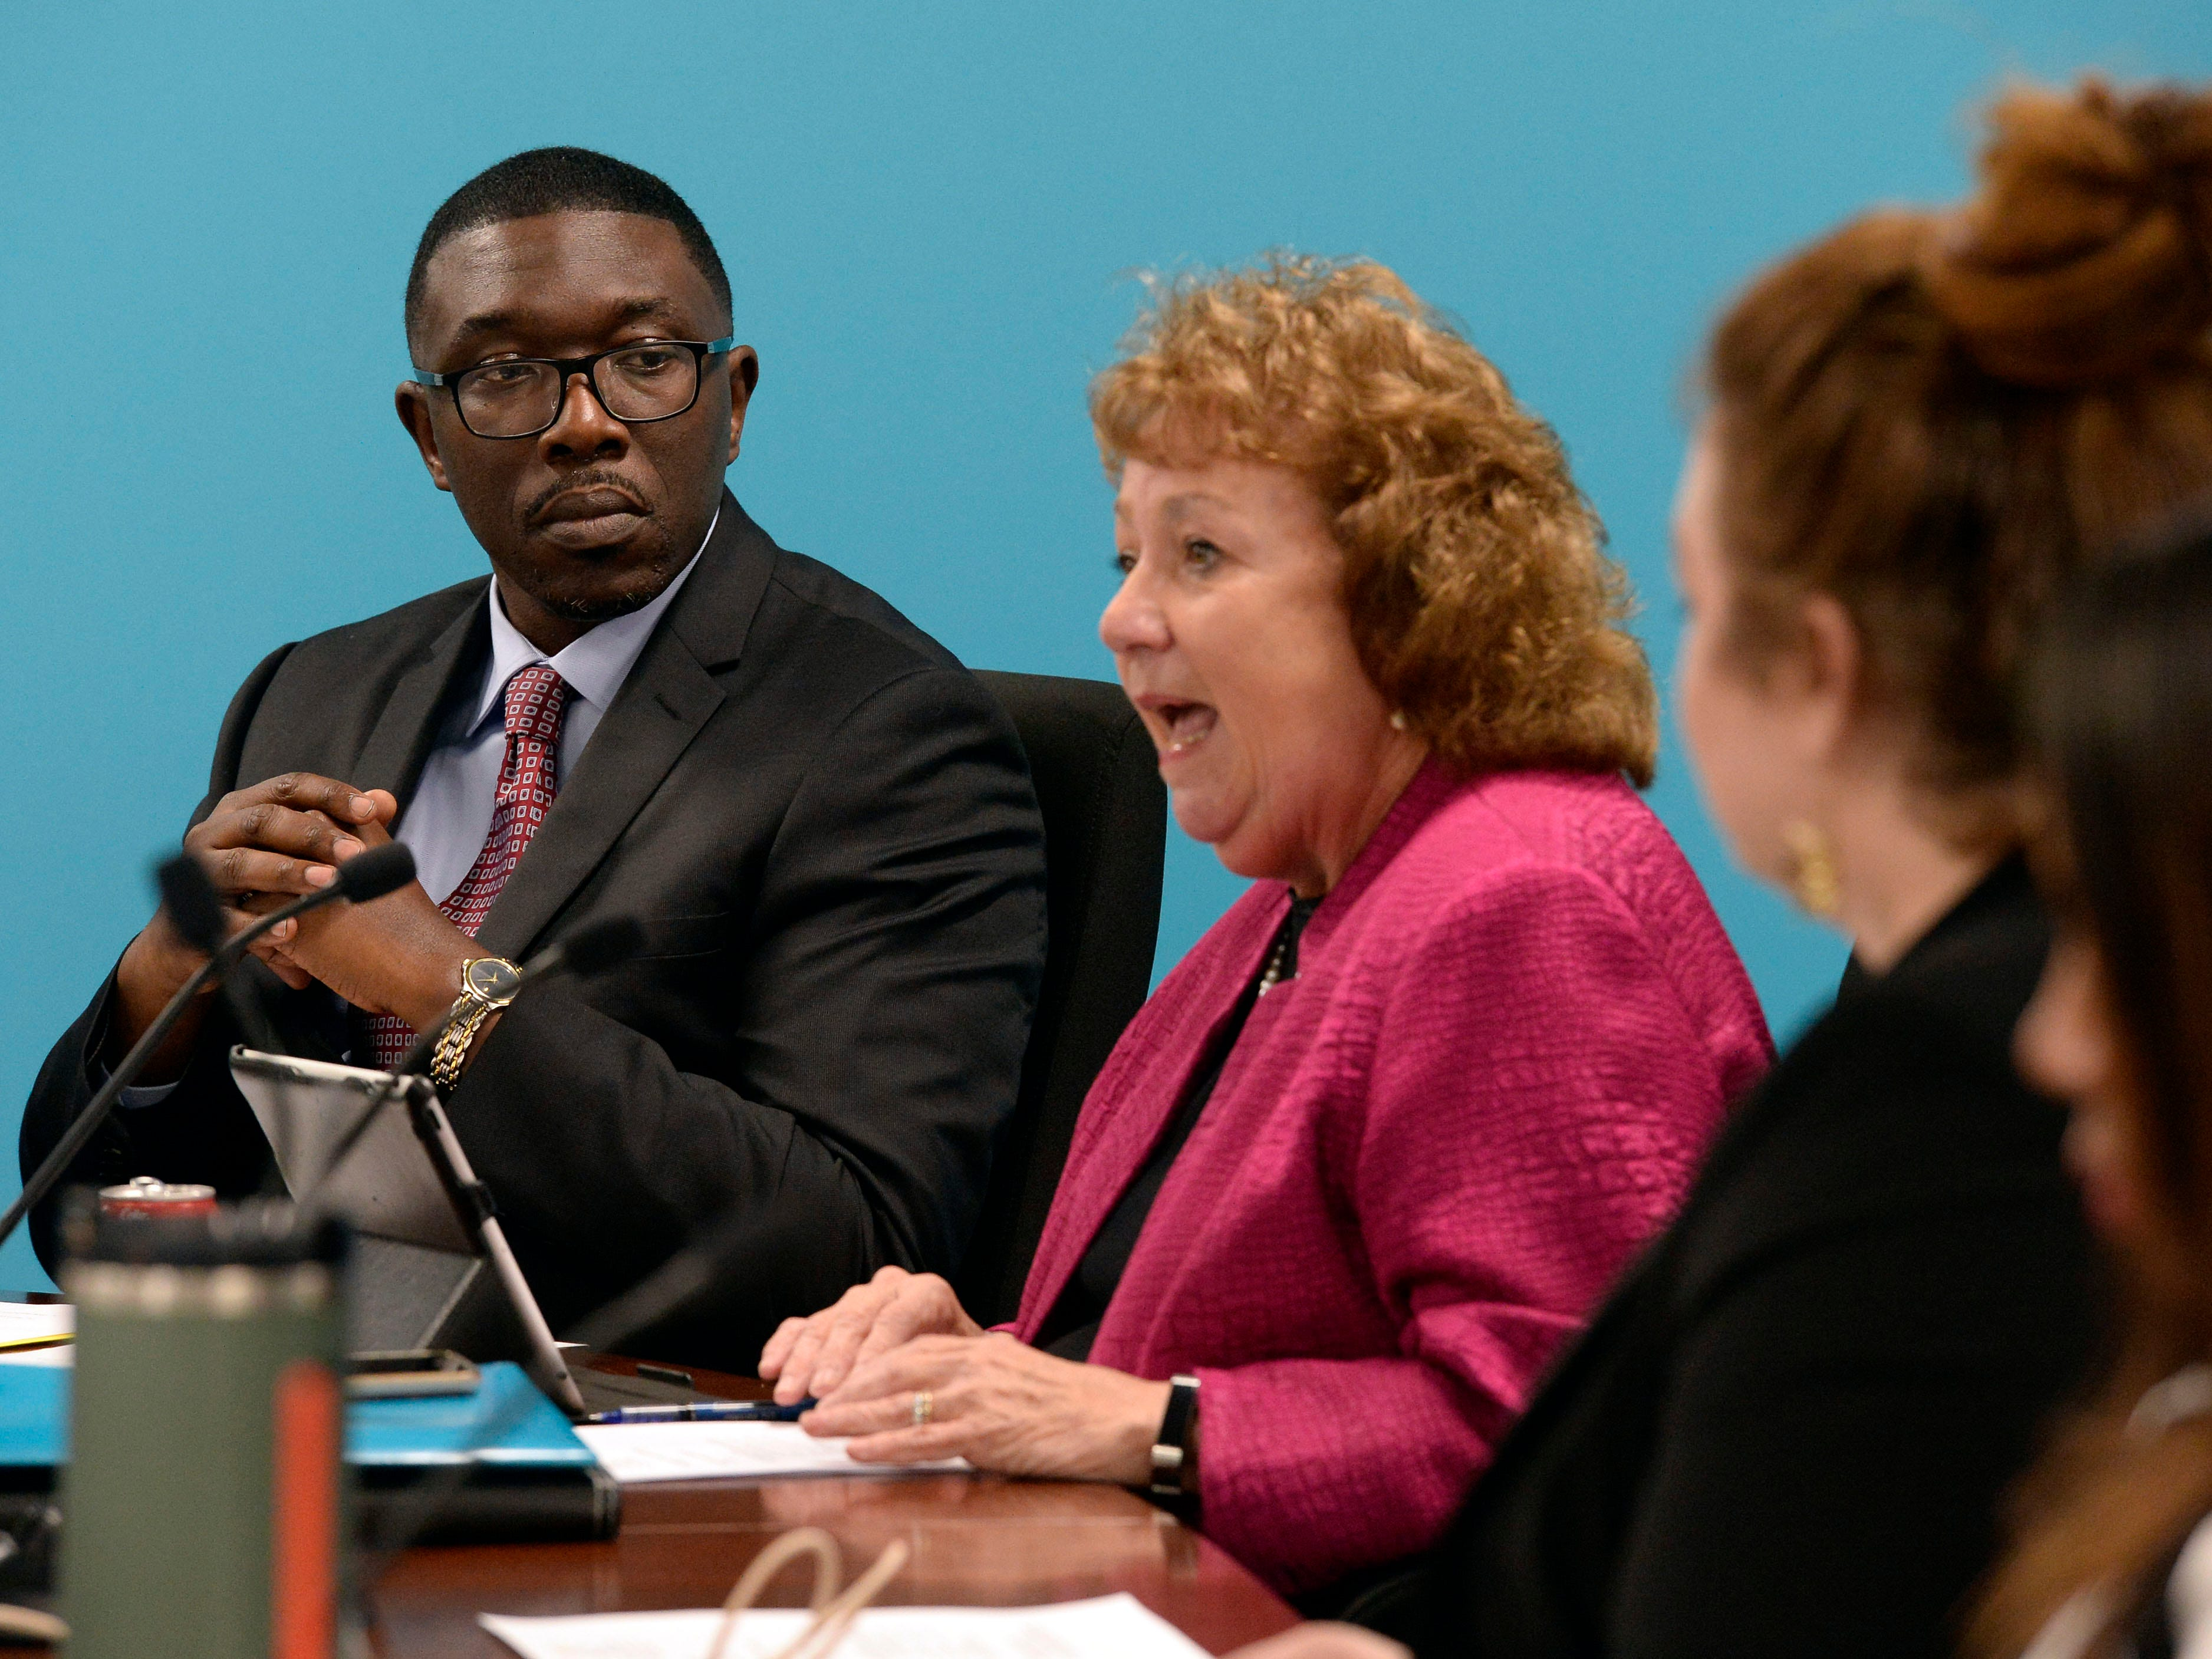 Nashville Director of Schools Shawn Joseph listens to a fellow Metropolitan Nashville Public Board of Education board member speak at a meeting on Tuesday, Jan. 8, 2019, in Nashville, Tenn.